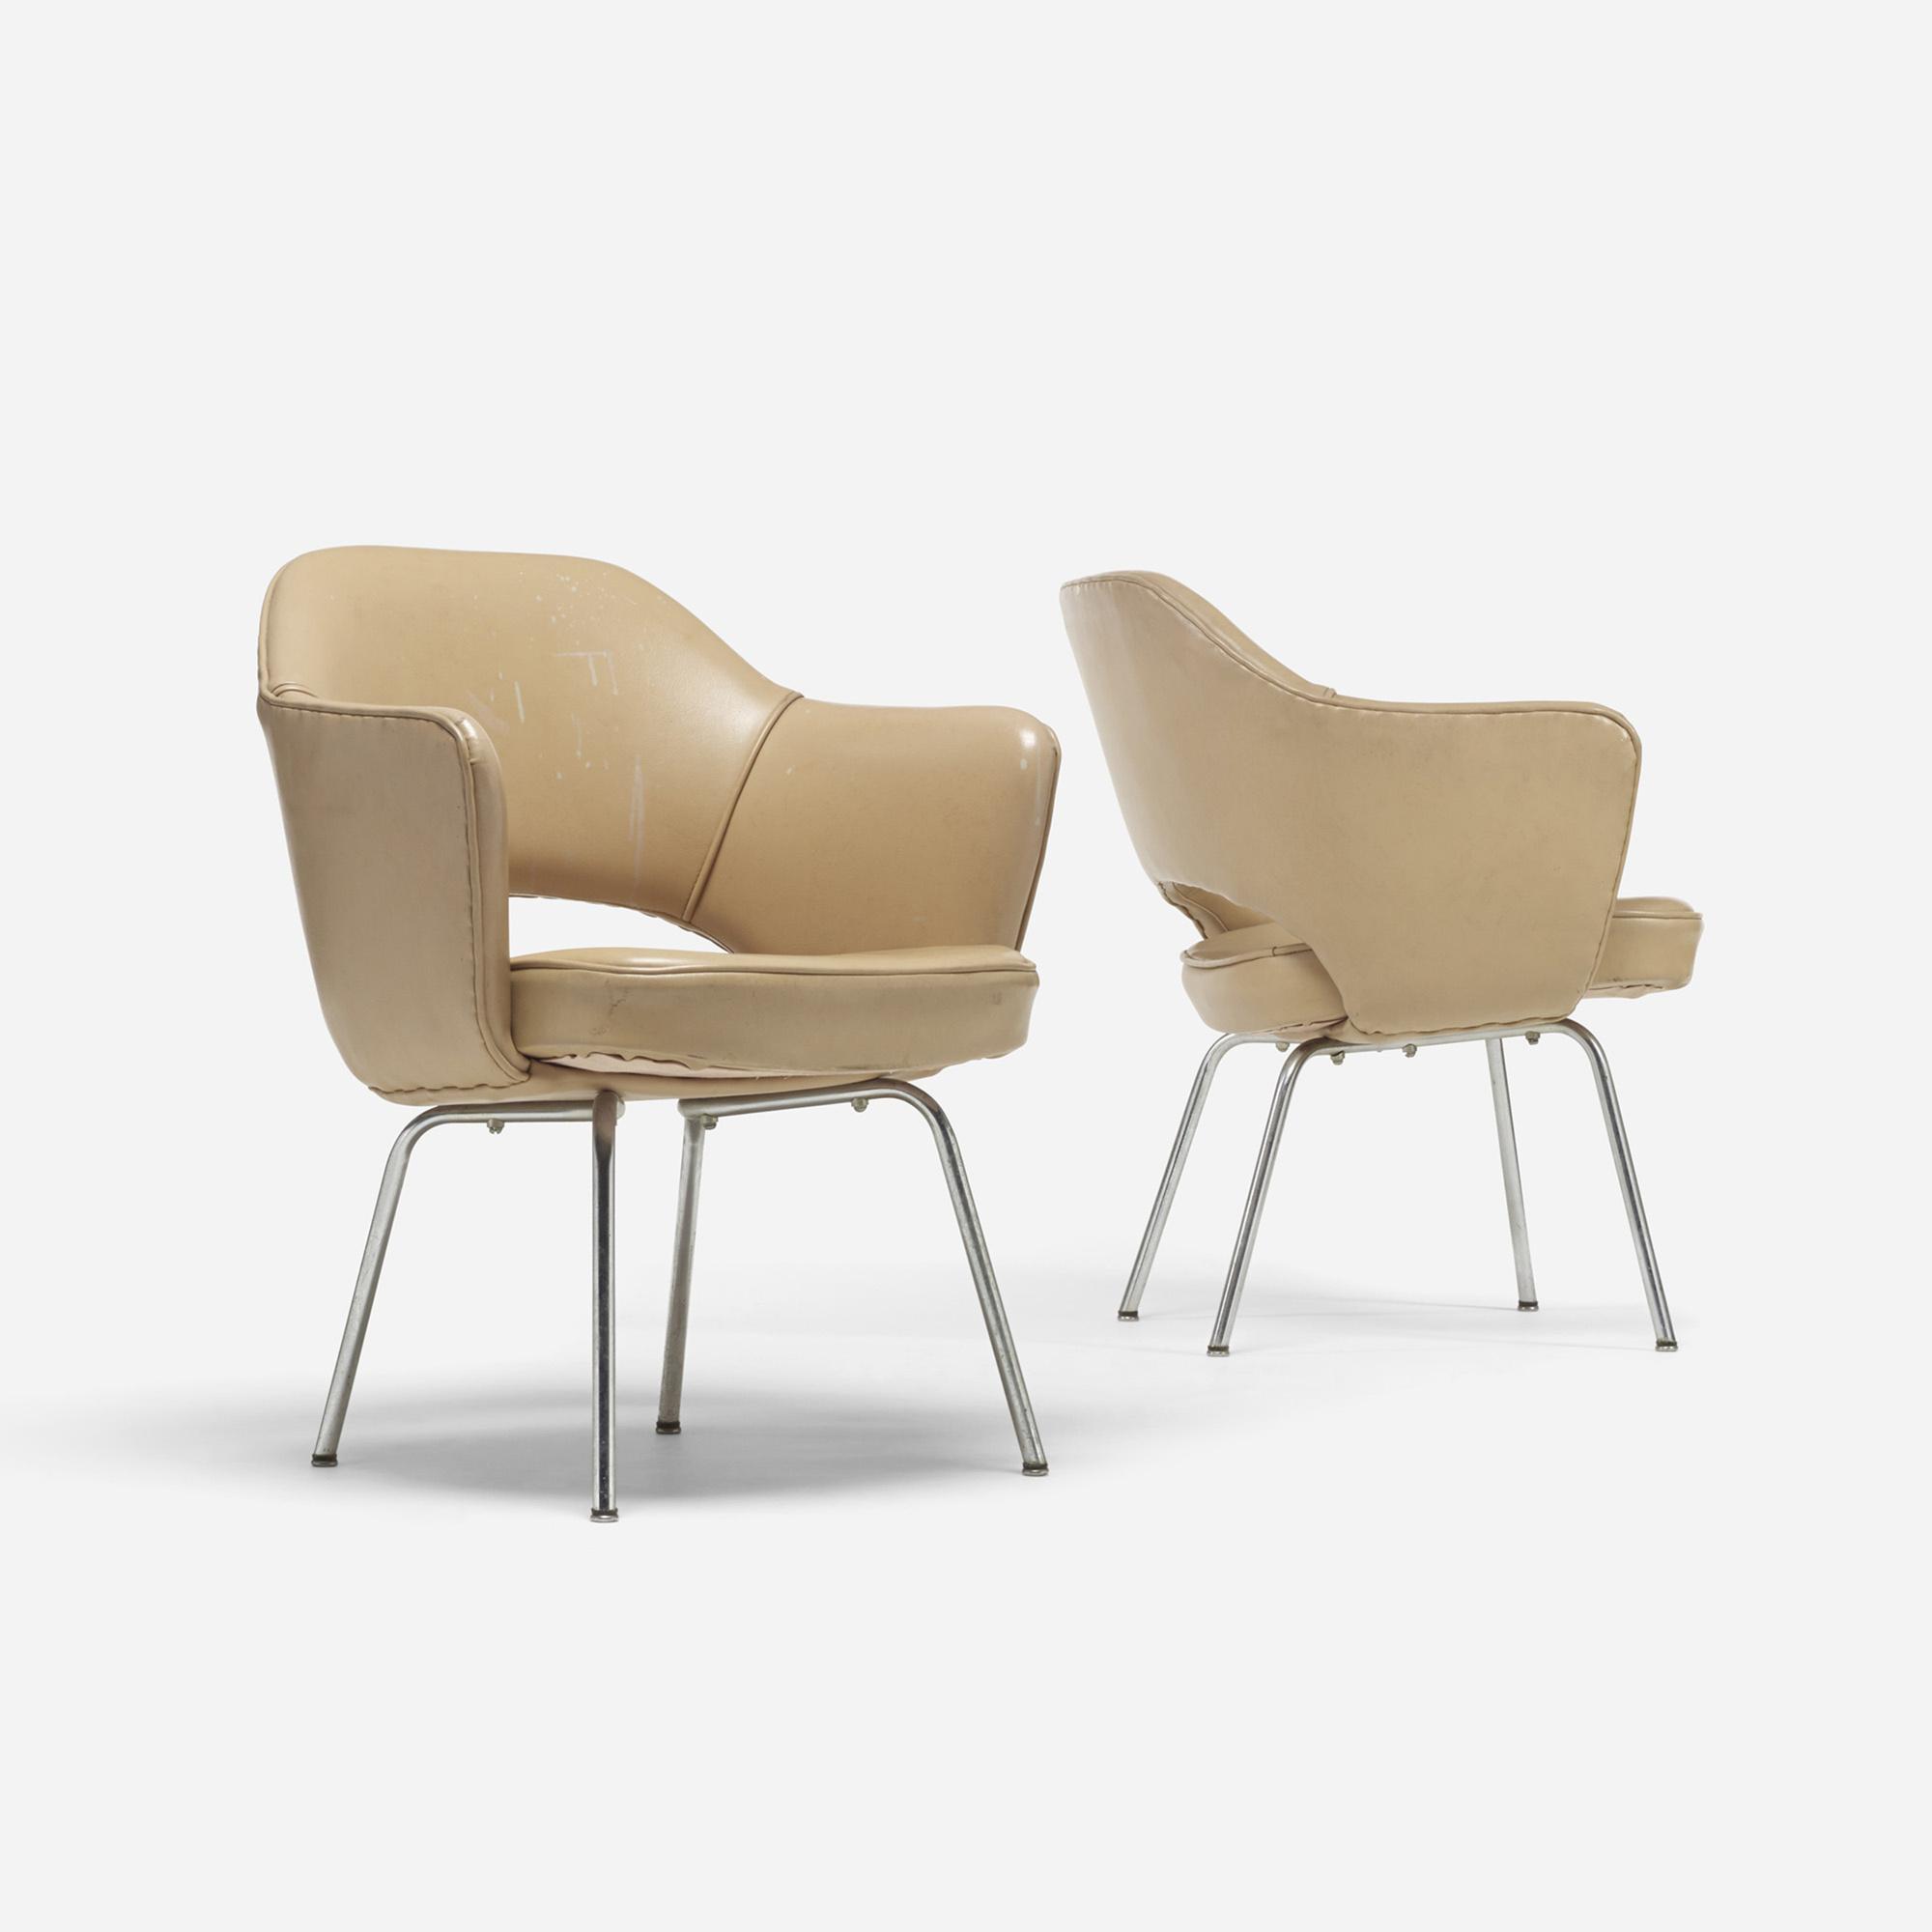 701: Eero Saarinen / Executive armchairs, pair (2 of 4)